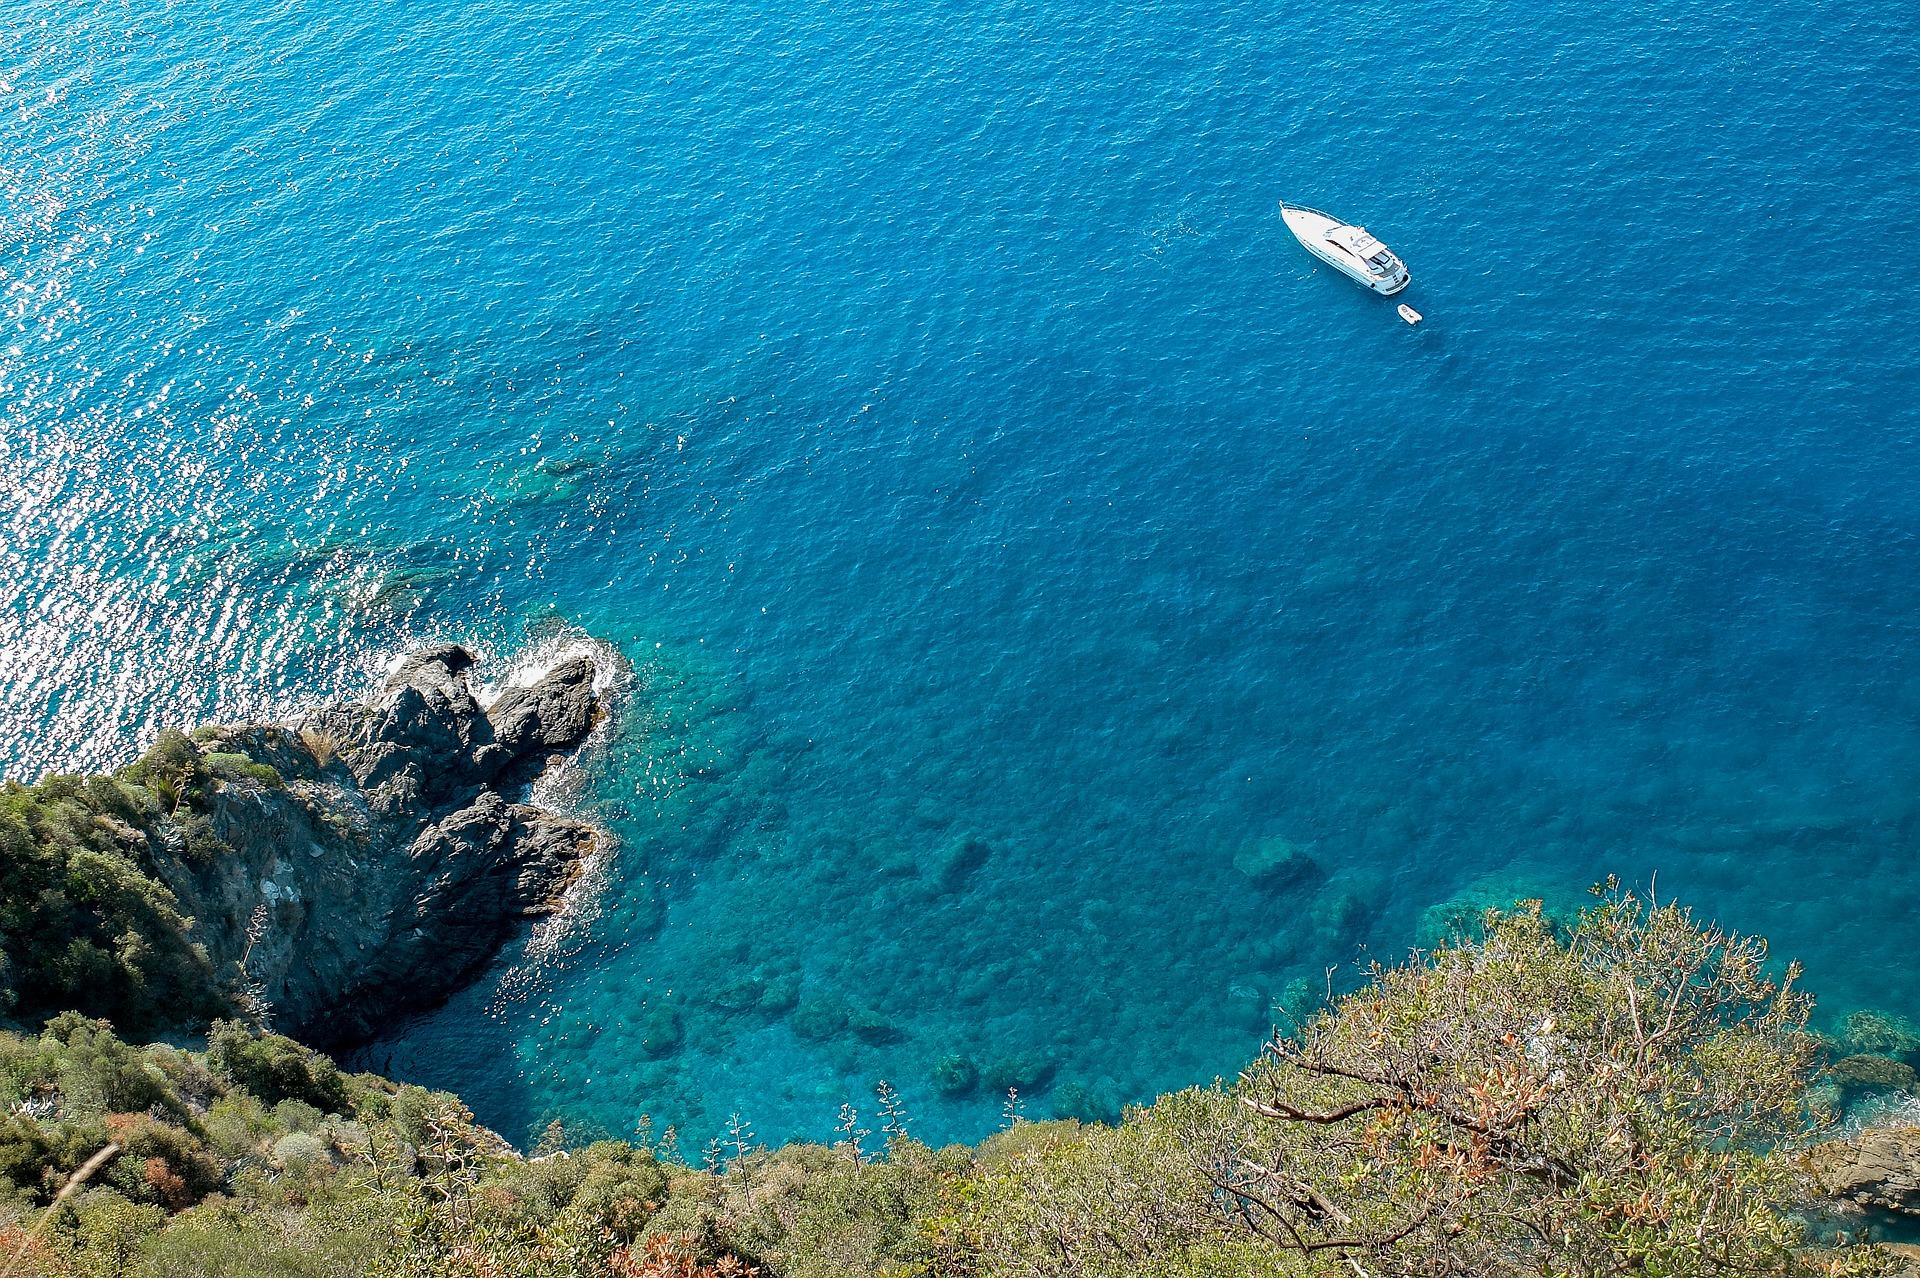 Online Bootsanmeldung Kroatien Kurtaxe Permit Vignette Boot Aufenthaltsgebühr anmelden